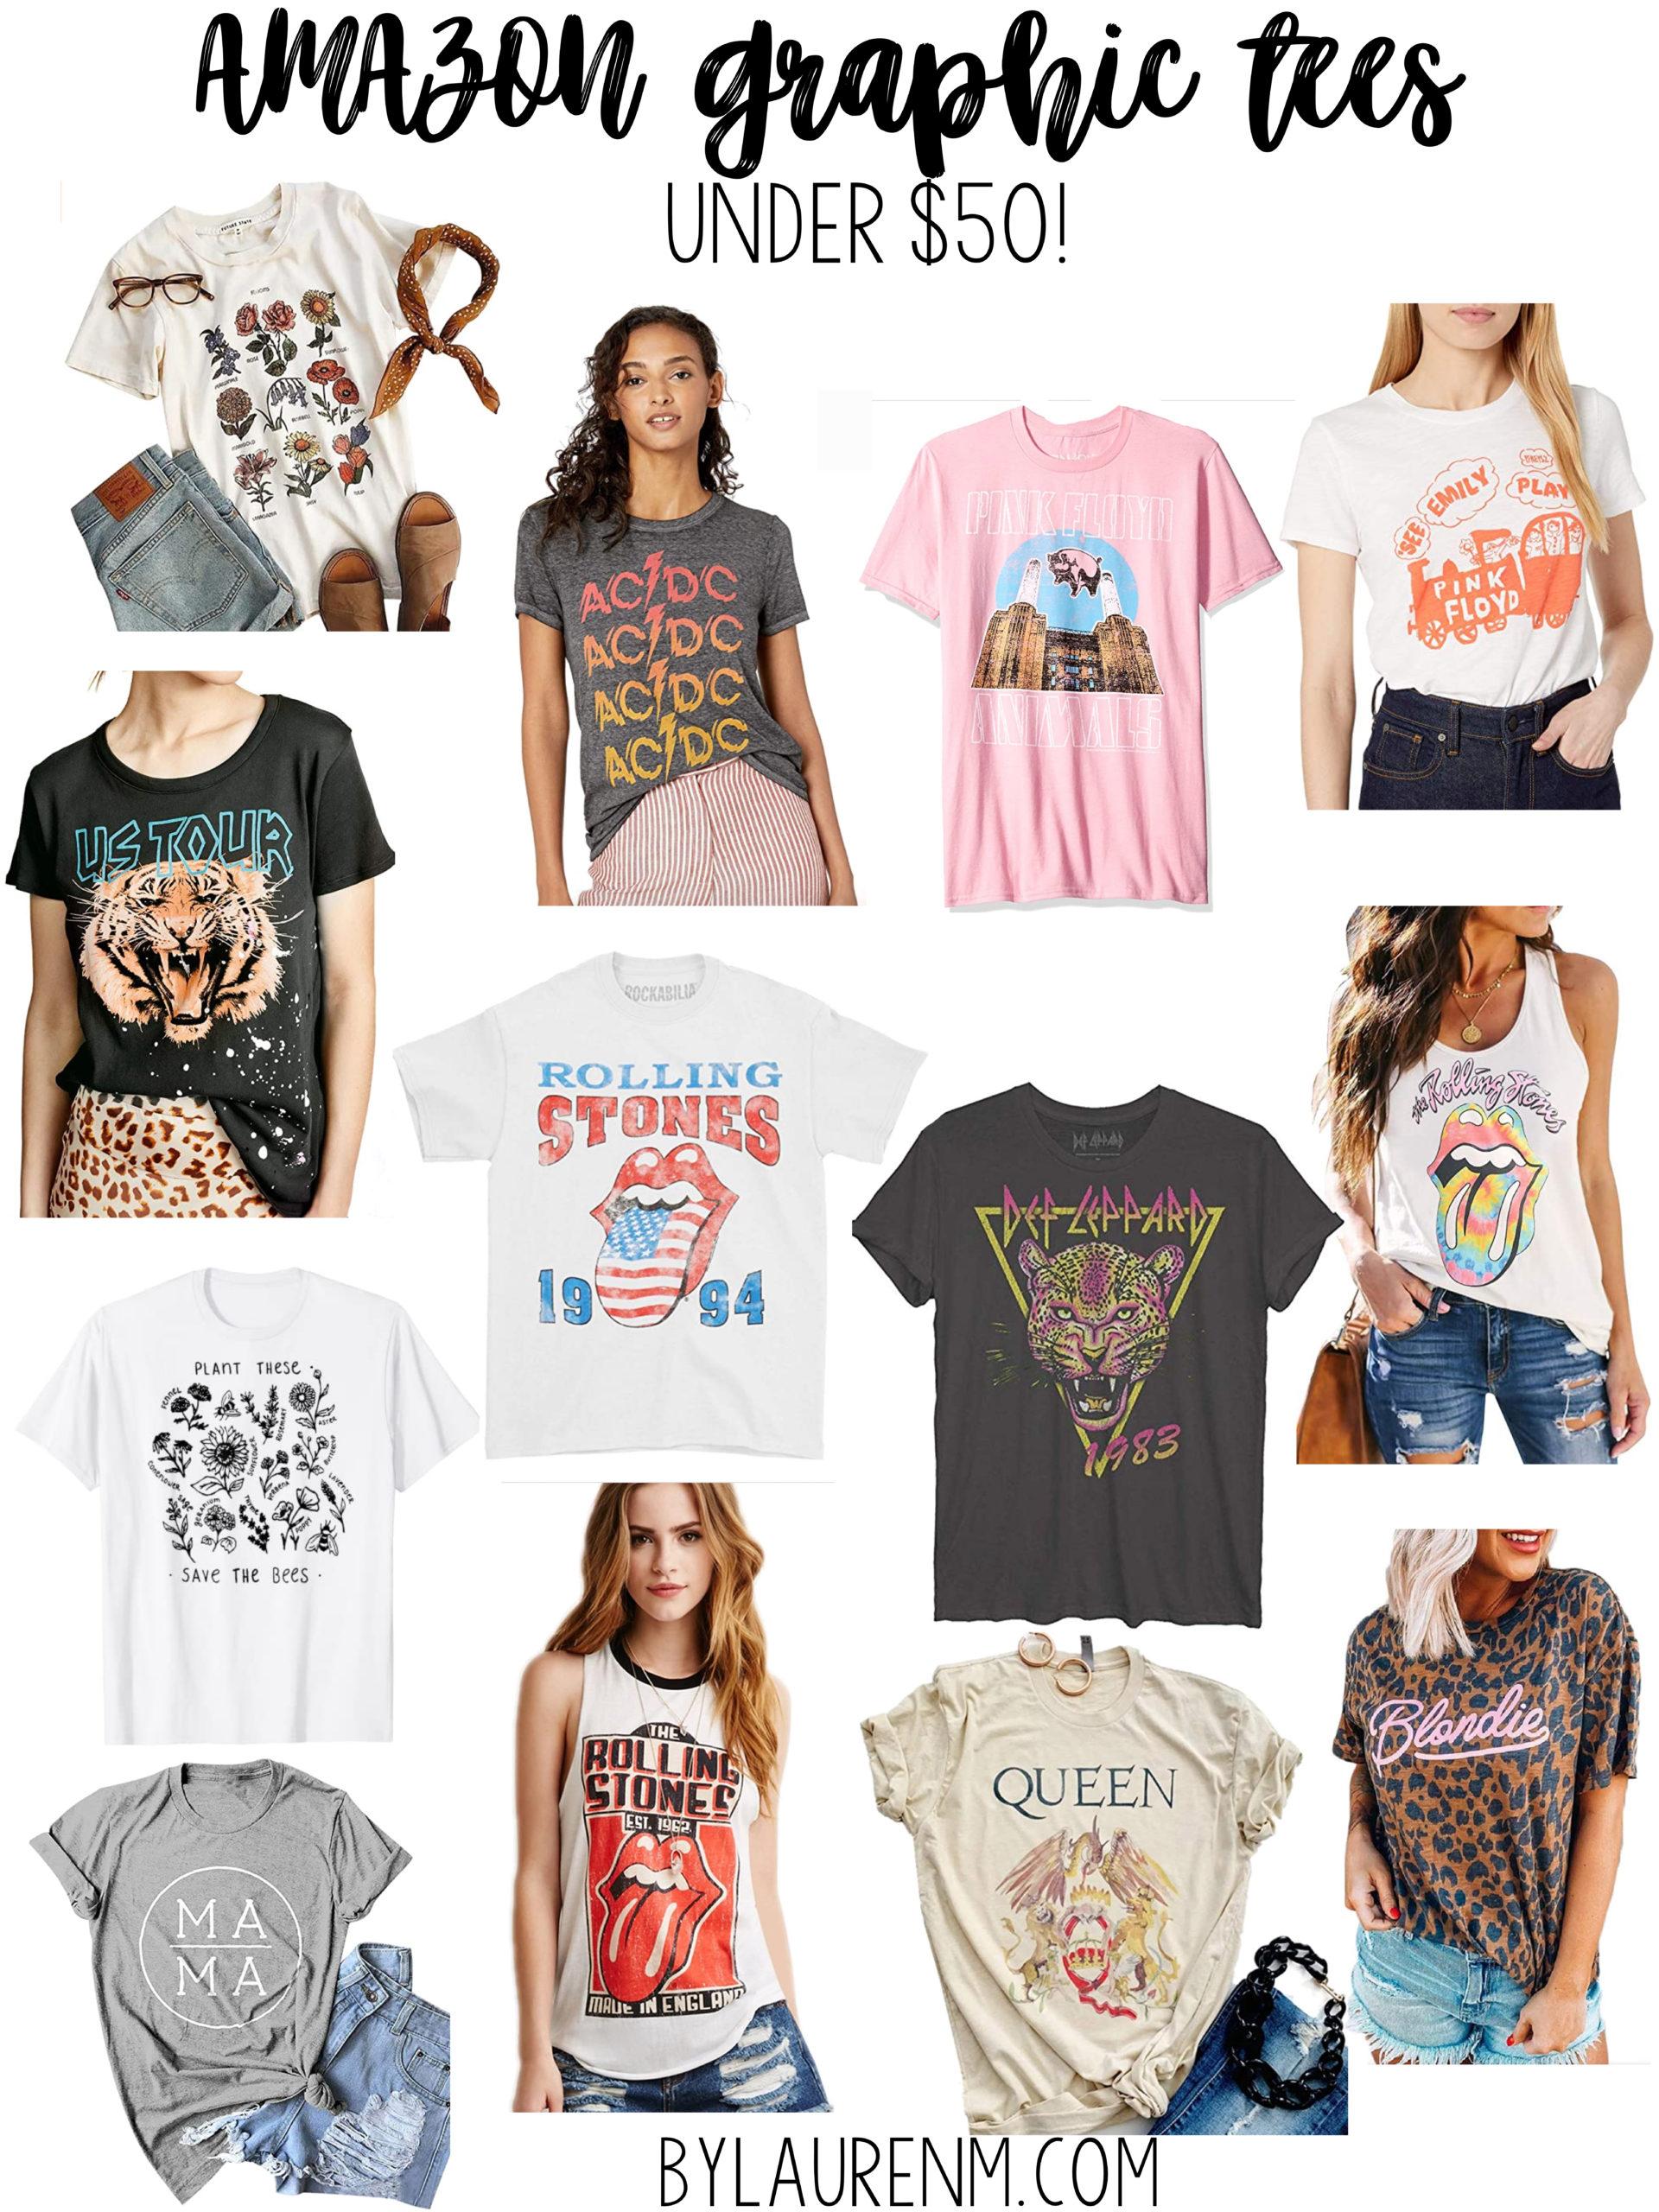 Virginia blogger, Lauren Dix, shares over 15 Amazon graphic tees under $50!